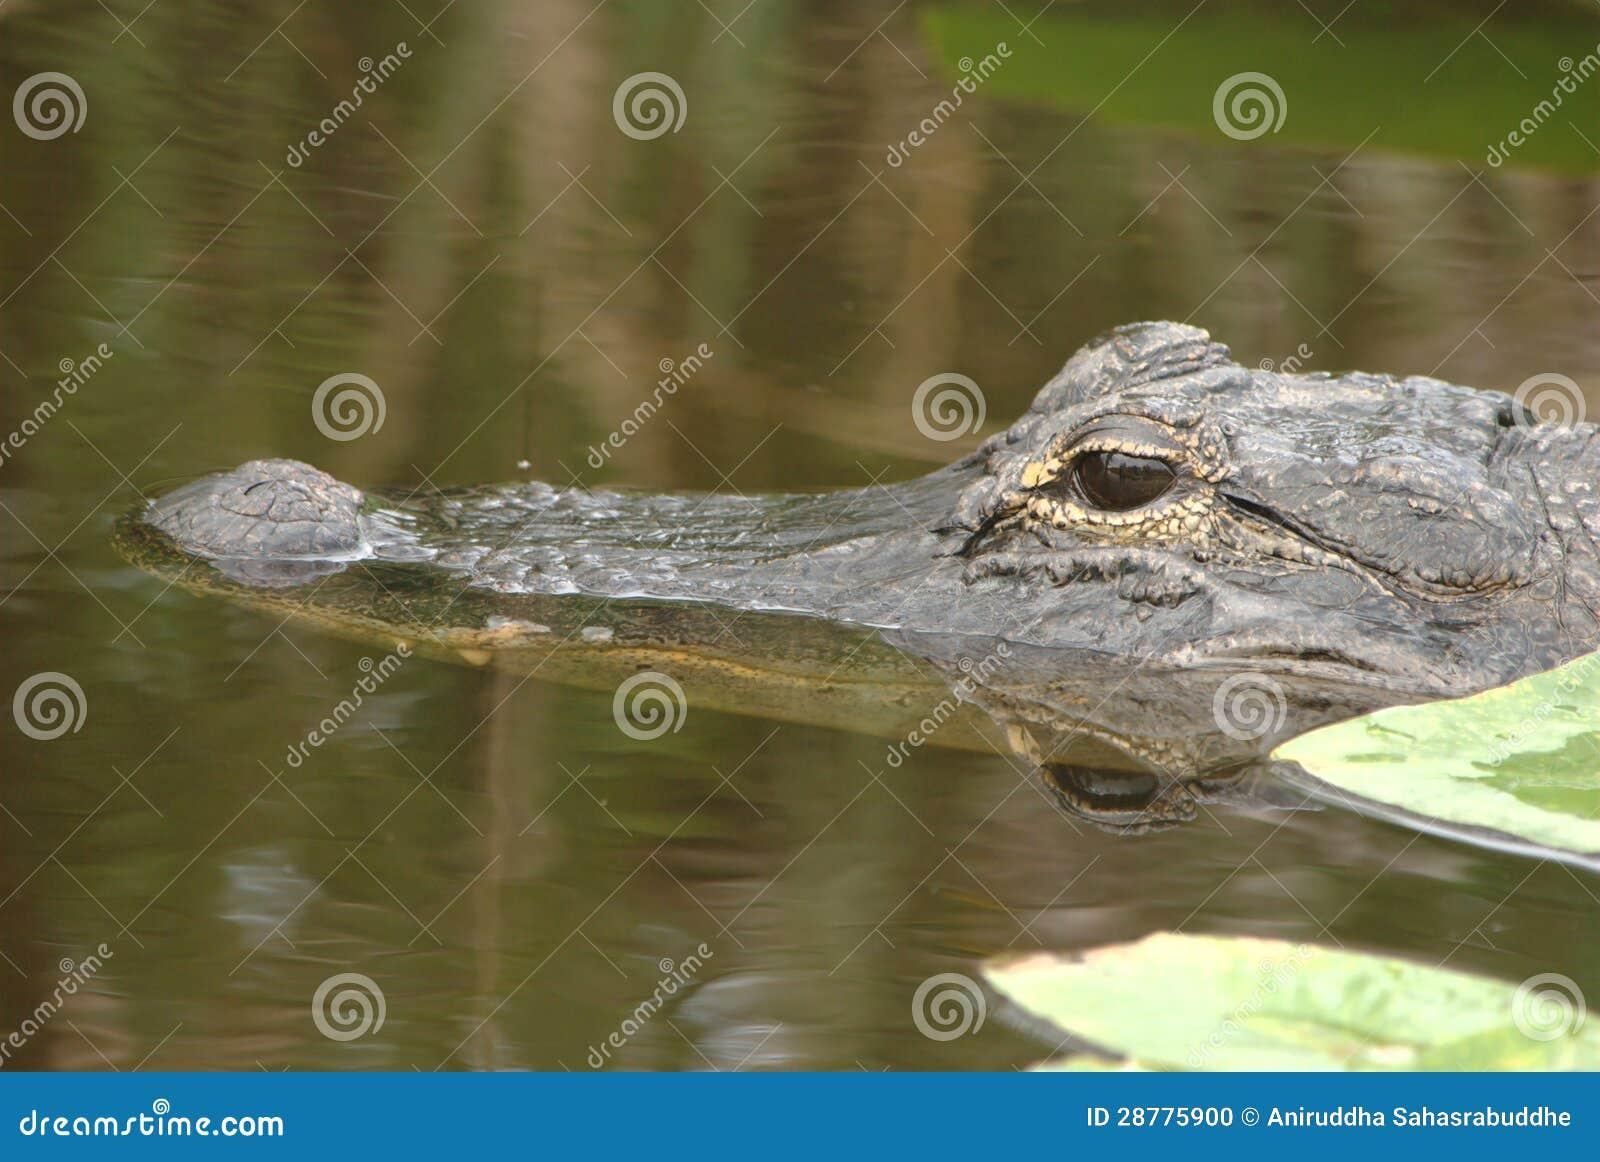 Alligator dans sauvage